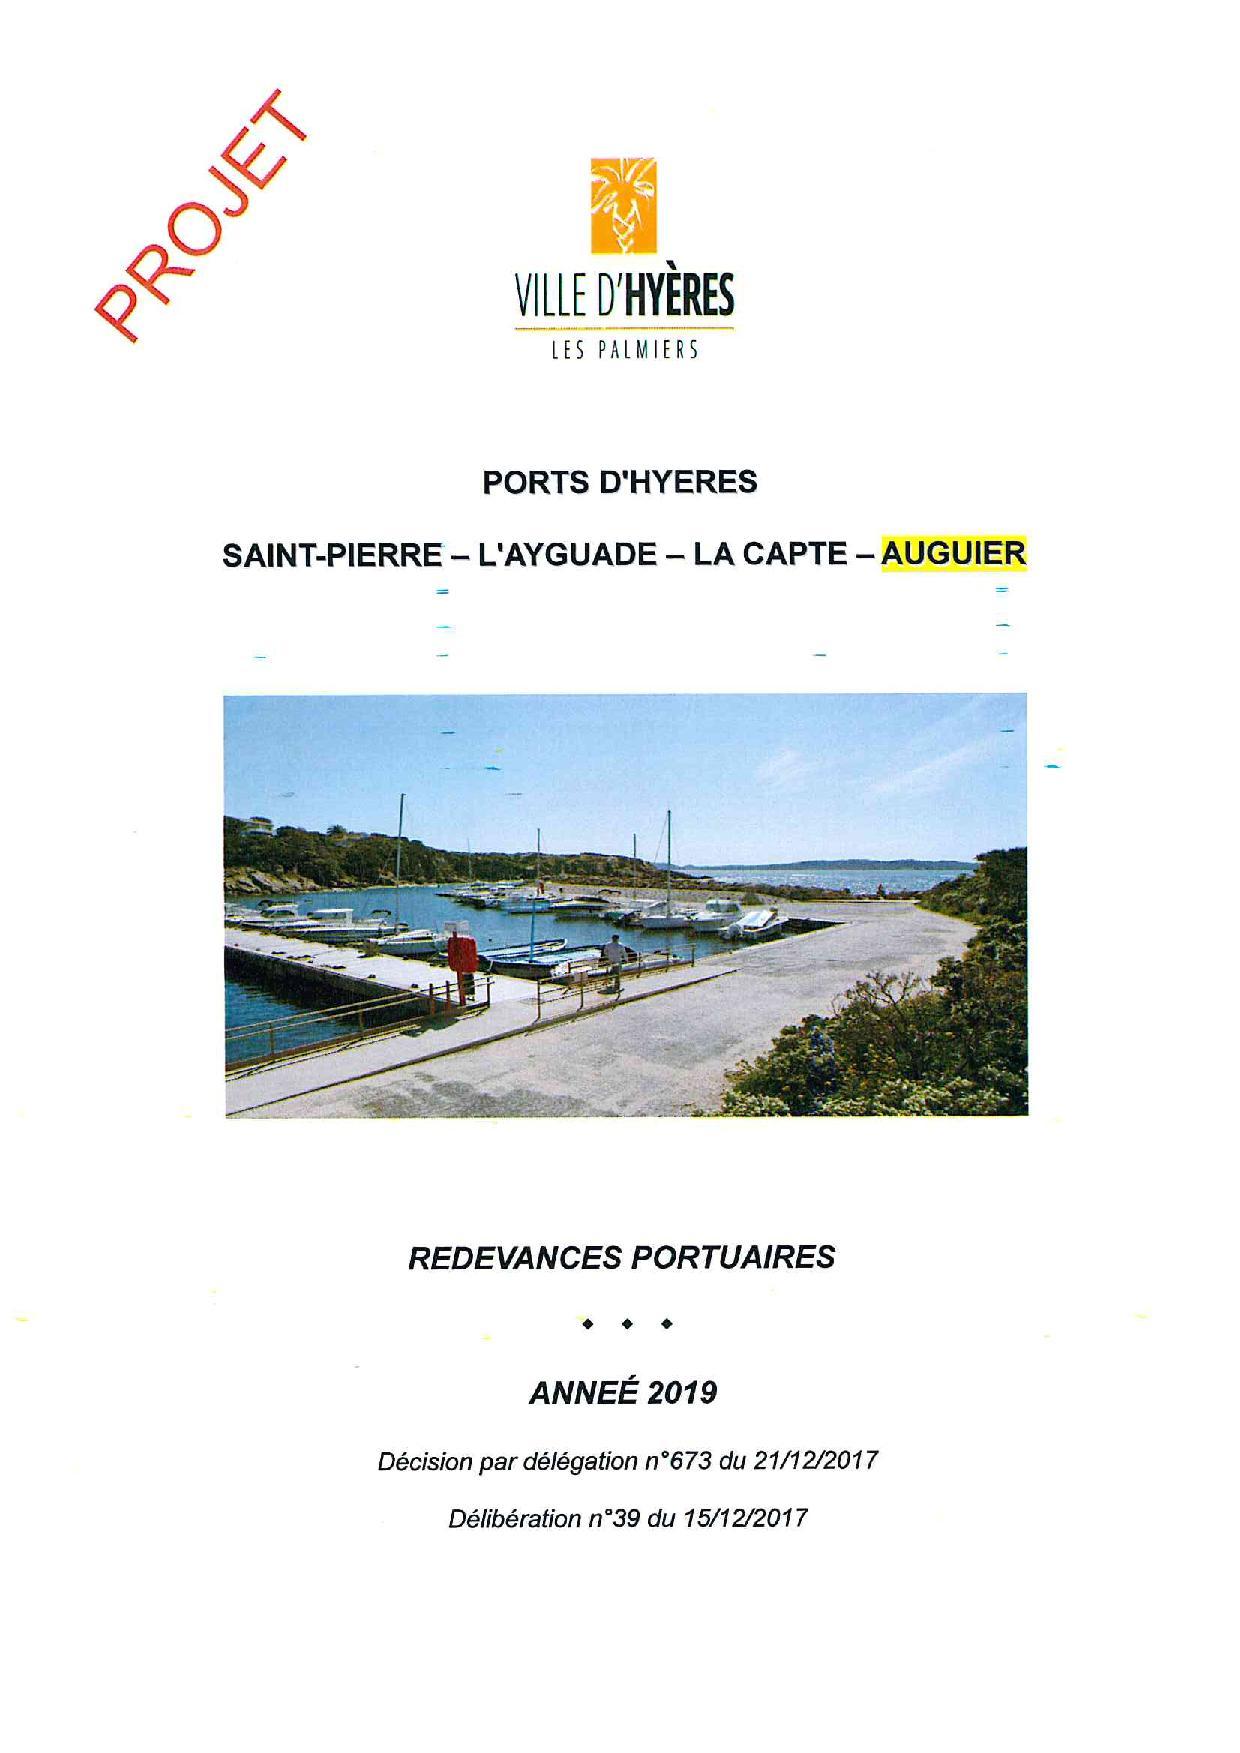 Tarifs du port Auguier